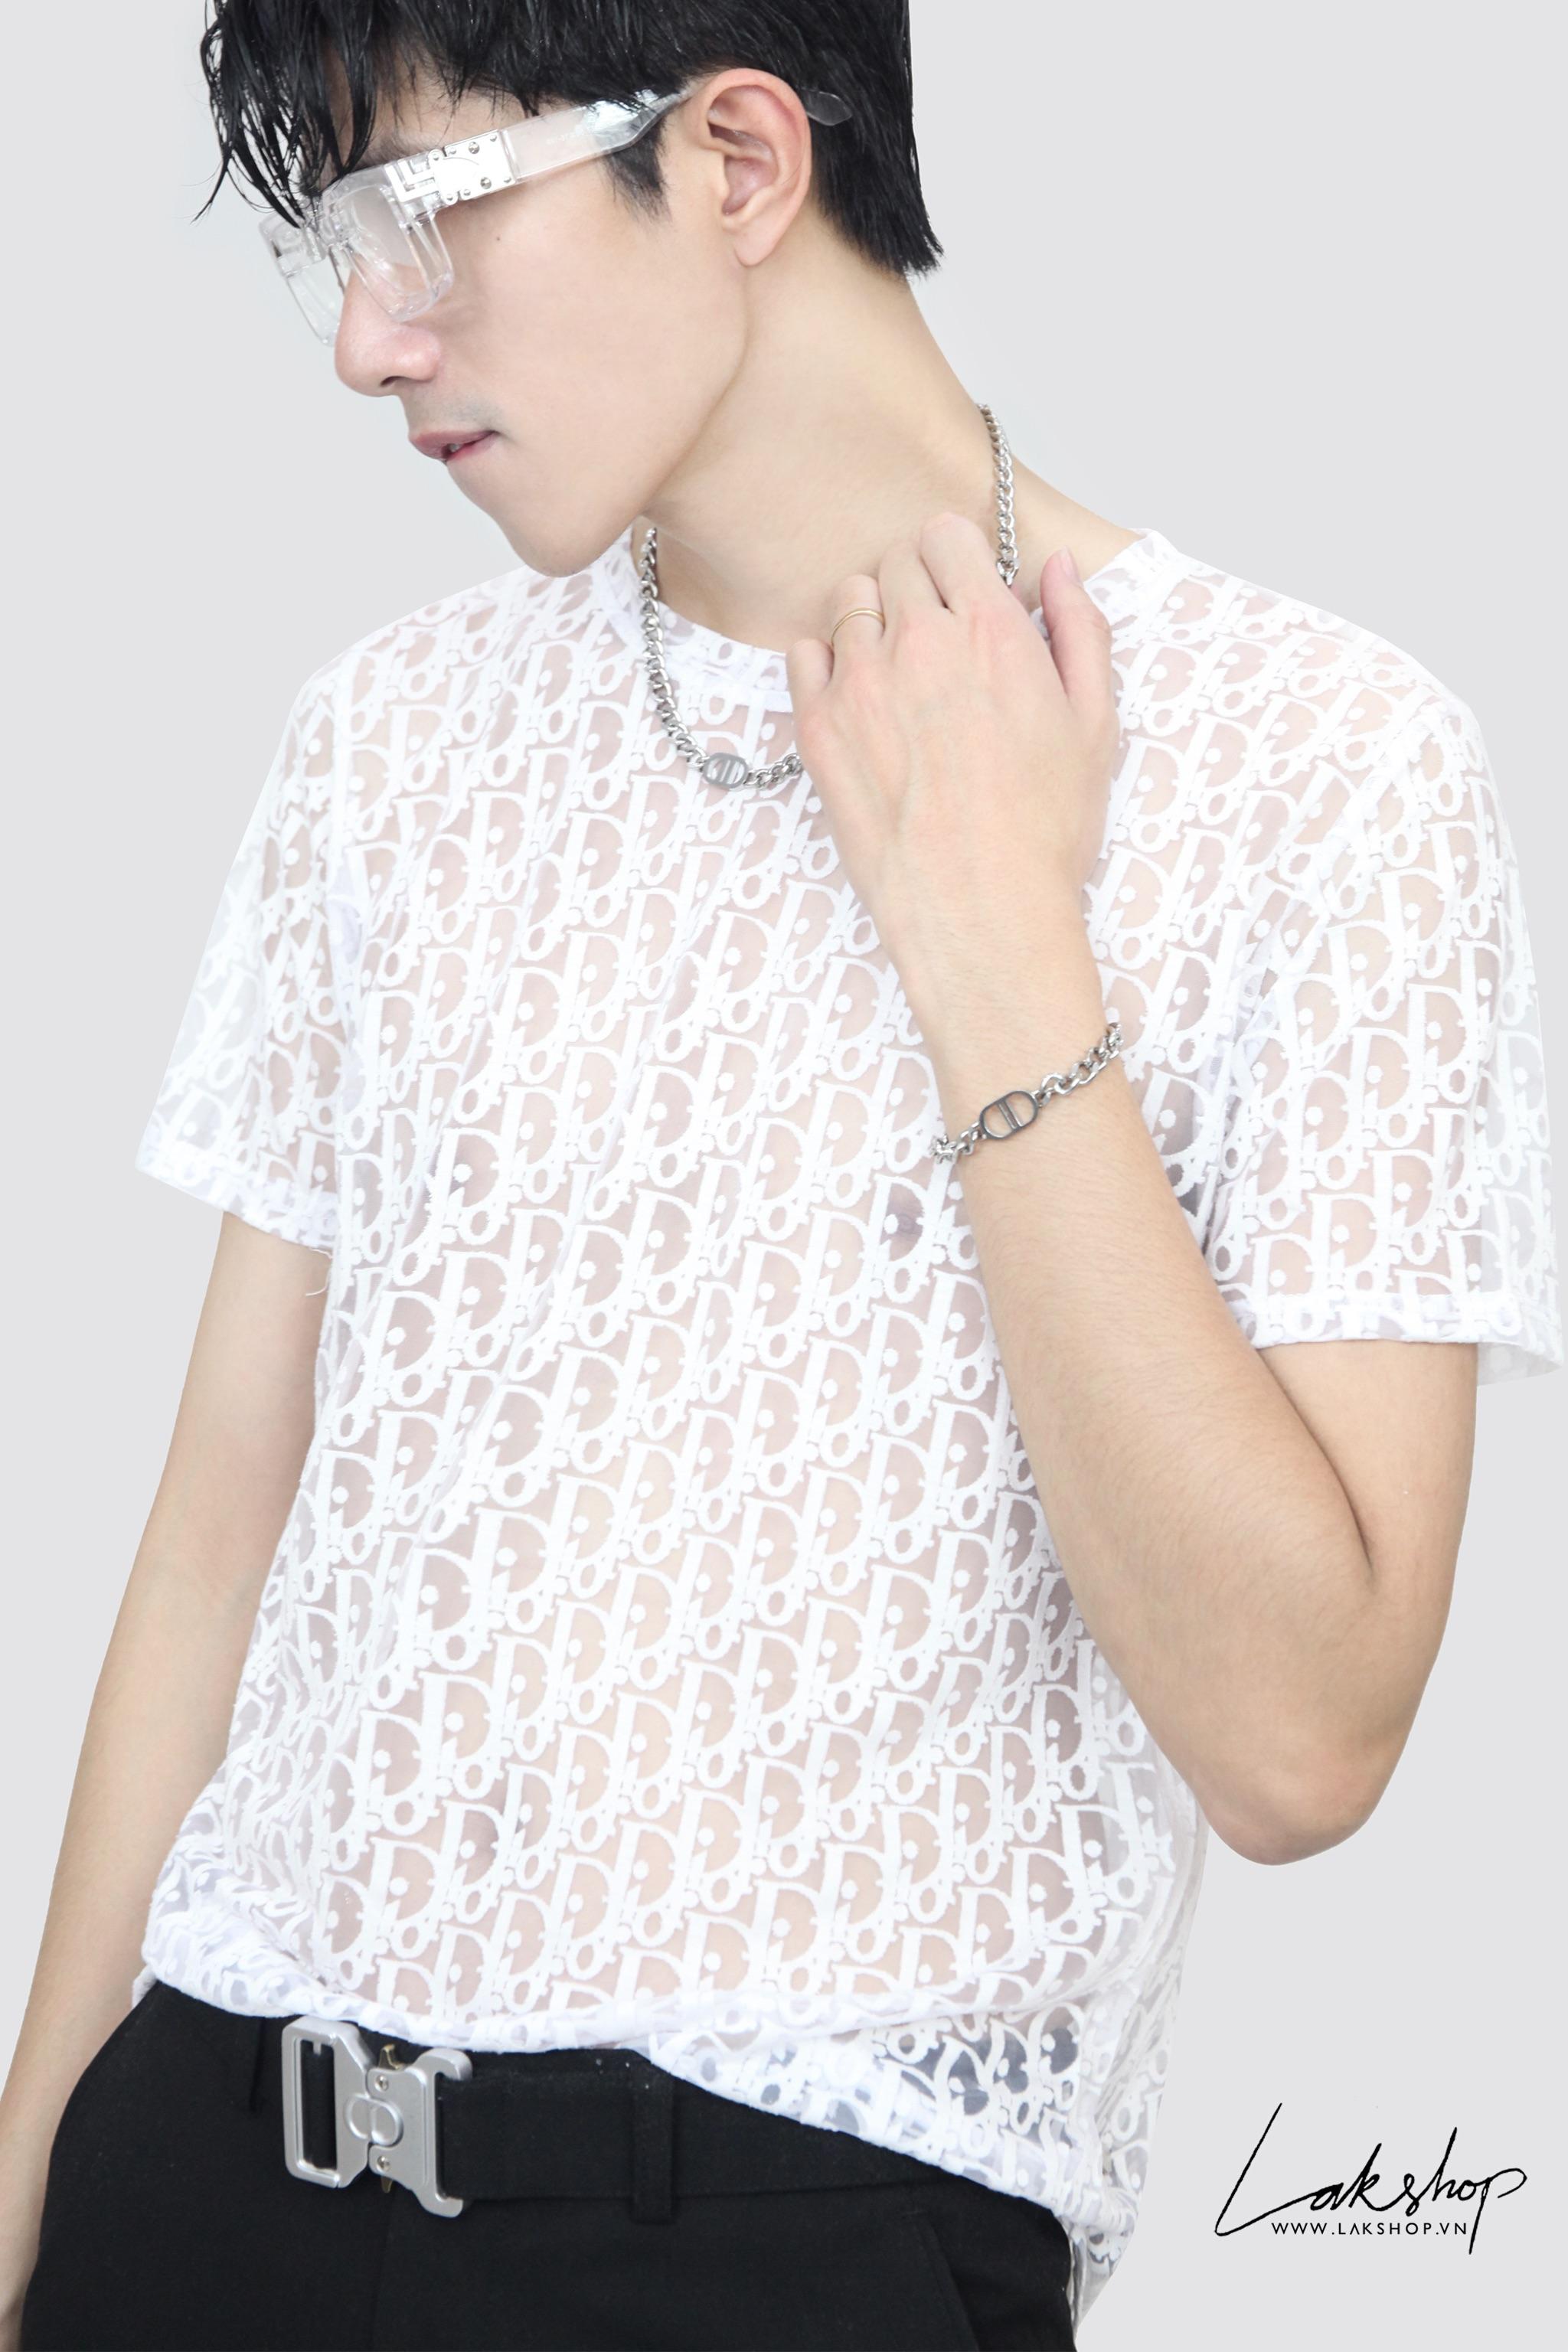 Dior Oblique Motif With White T-shirt